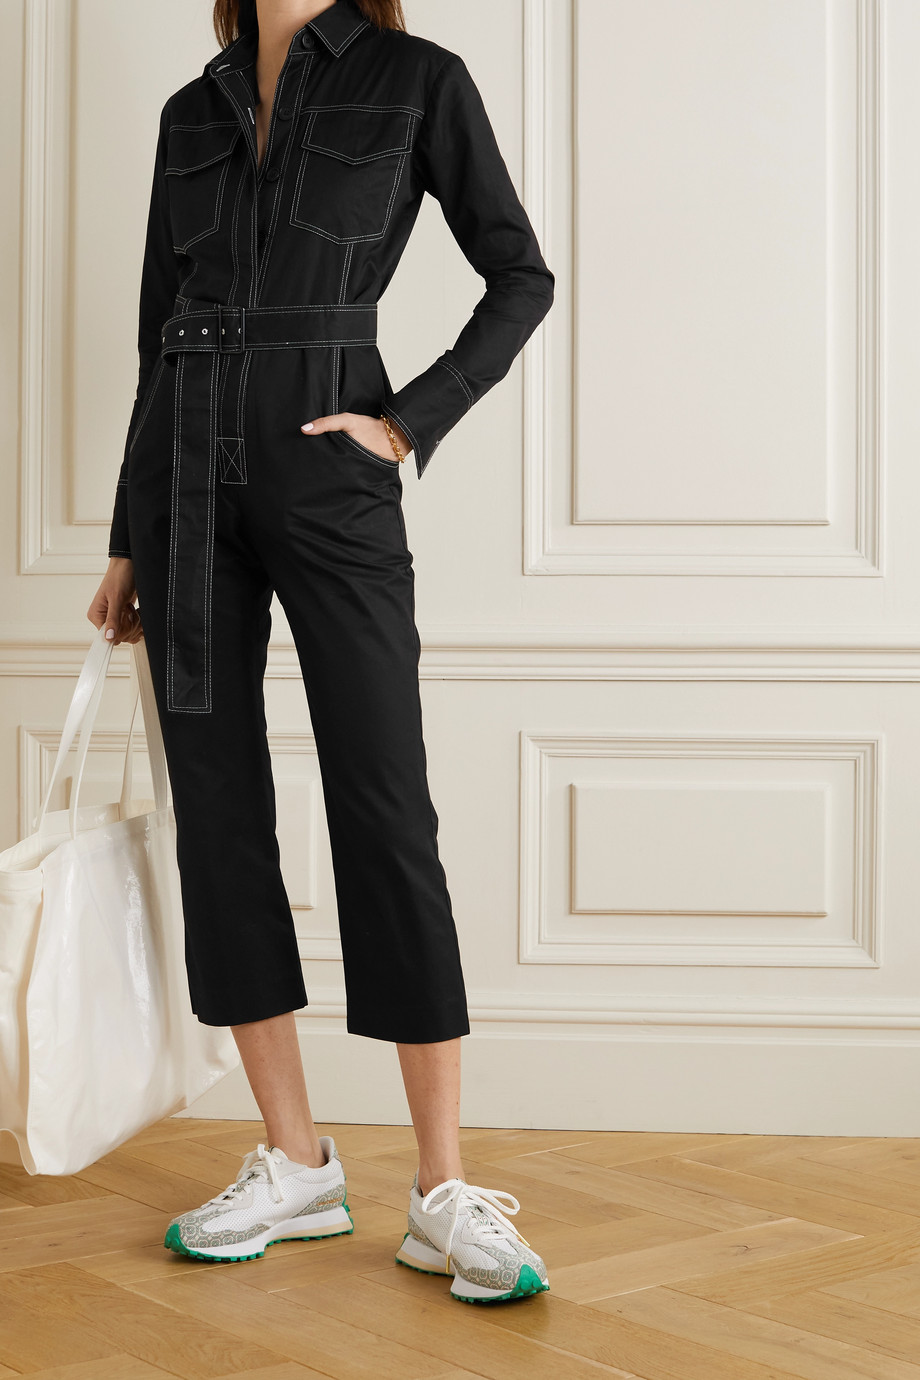 Orseund Iris Workwear 配腰带纯棉华达呢连身裤